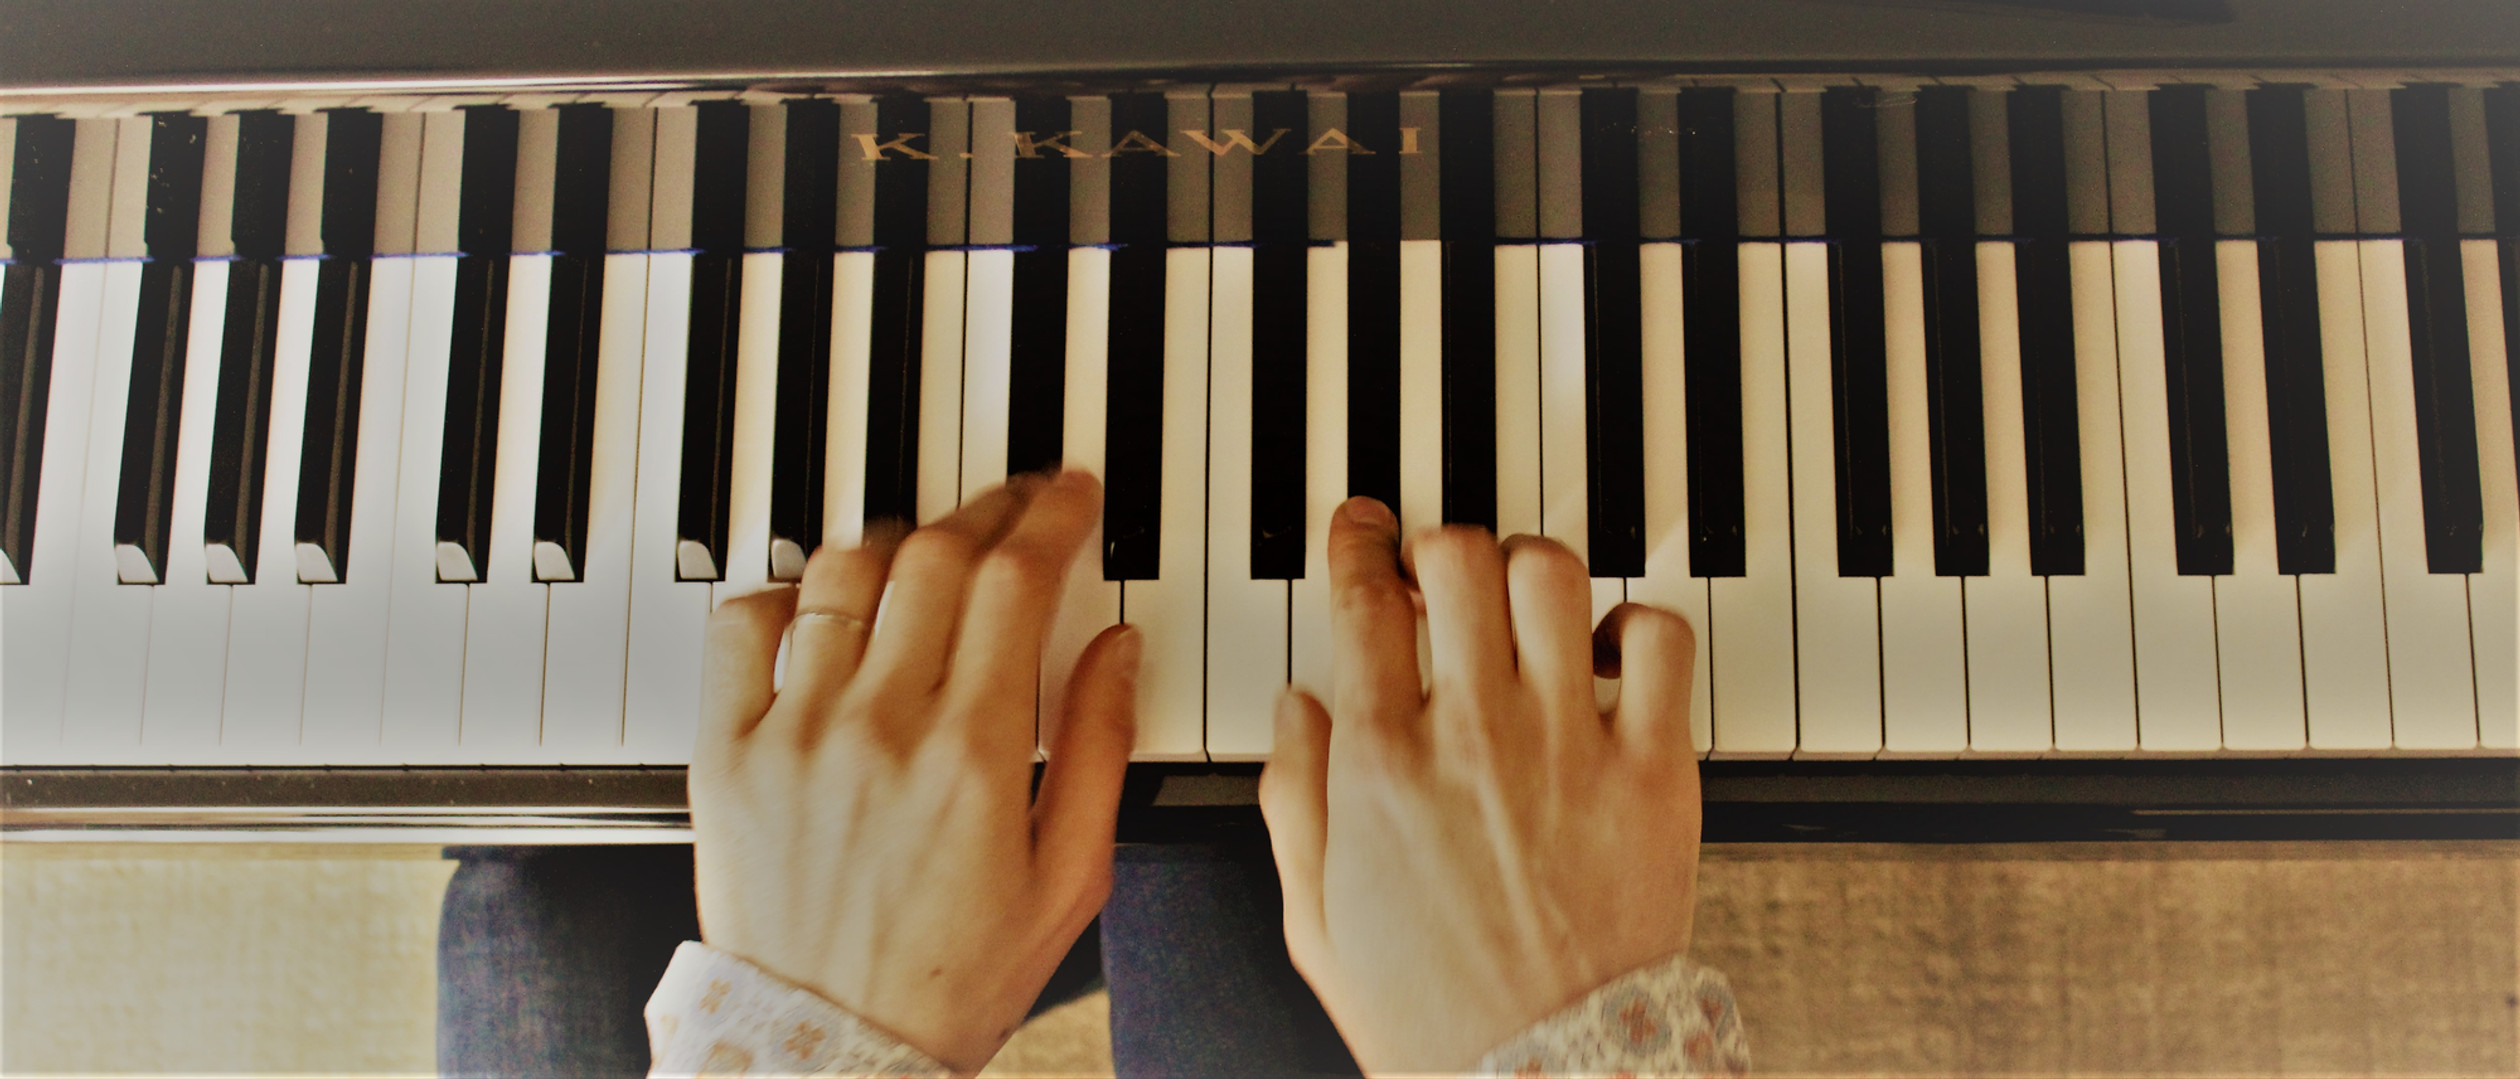 Piano Hands - Chase Loeb